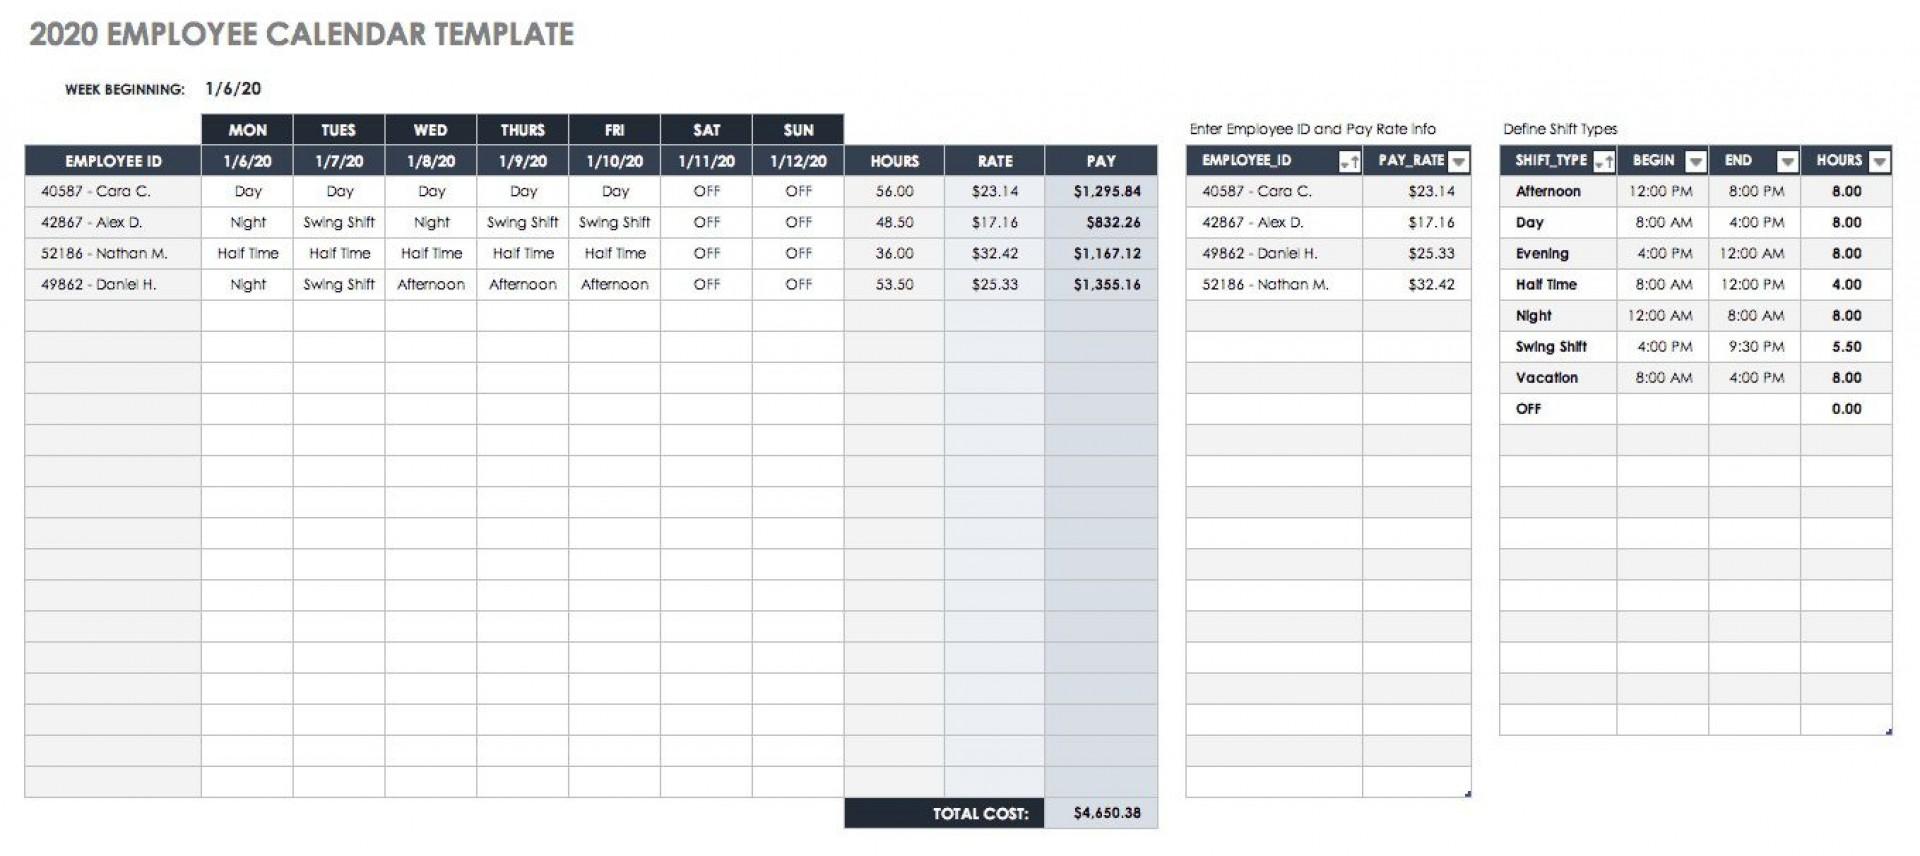 002 Stirring Google Doc Calendar Template 2020 Concept  Drive Sheet Weekly1920